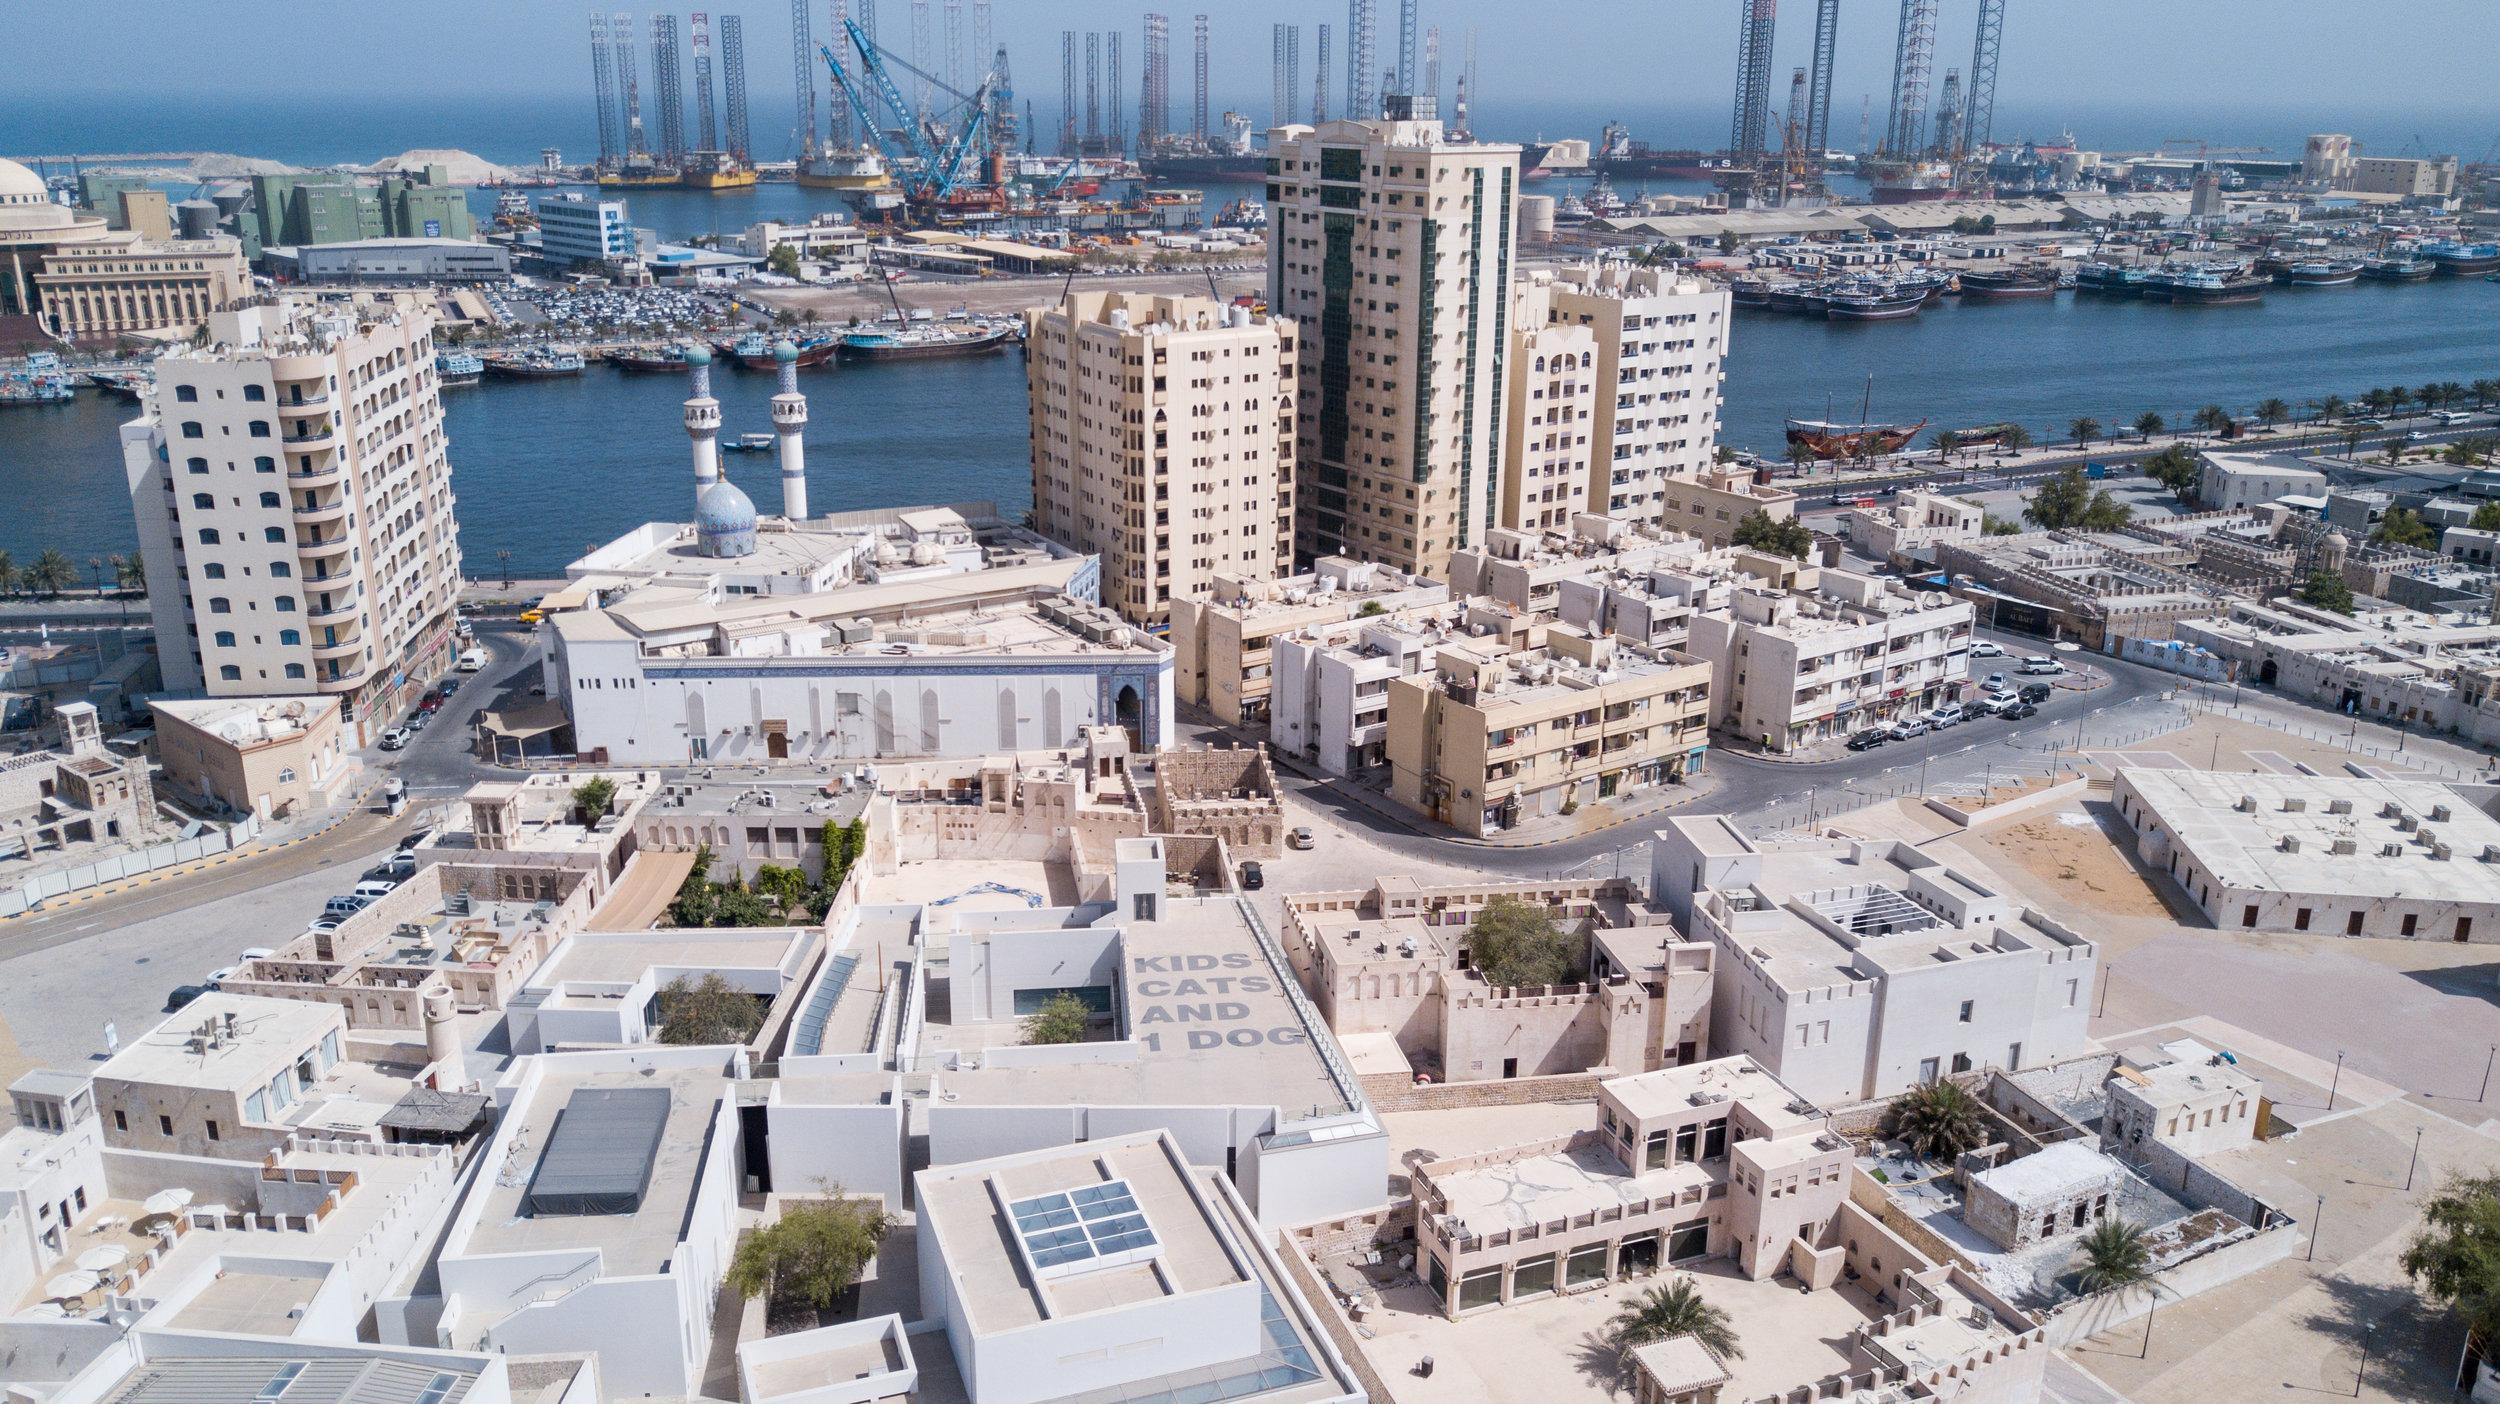 Sharjah Art Foundation Art Spaces in Al Mujeirah (aerial view). Courtesy Sharjah Art Foundation.